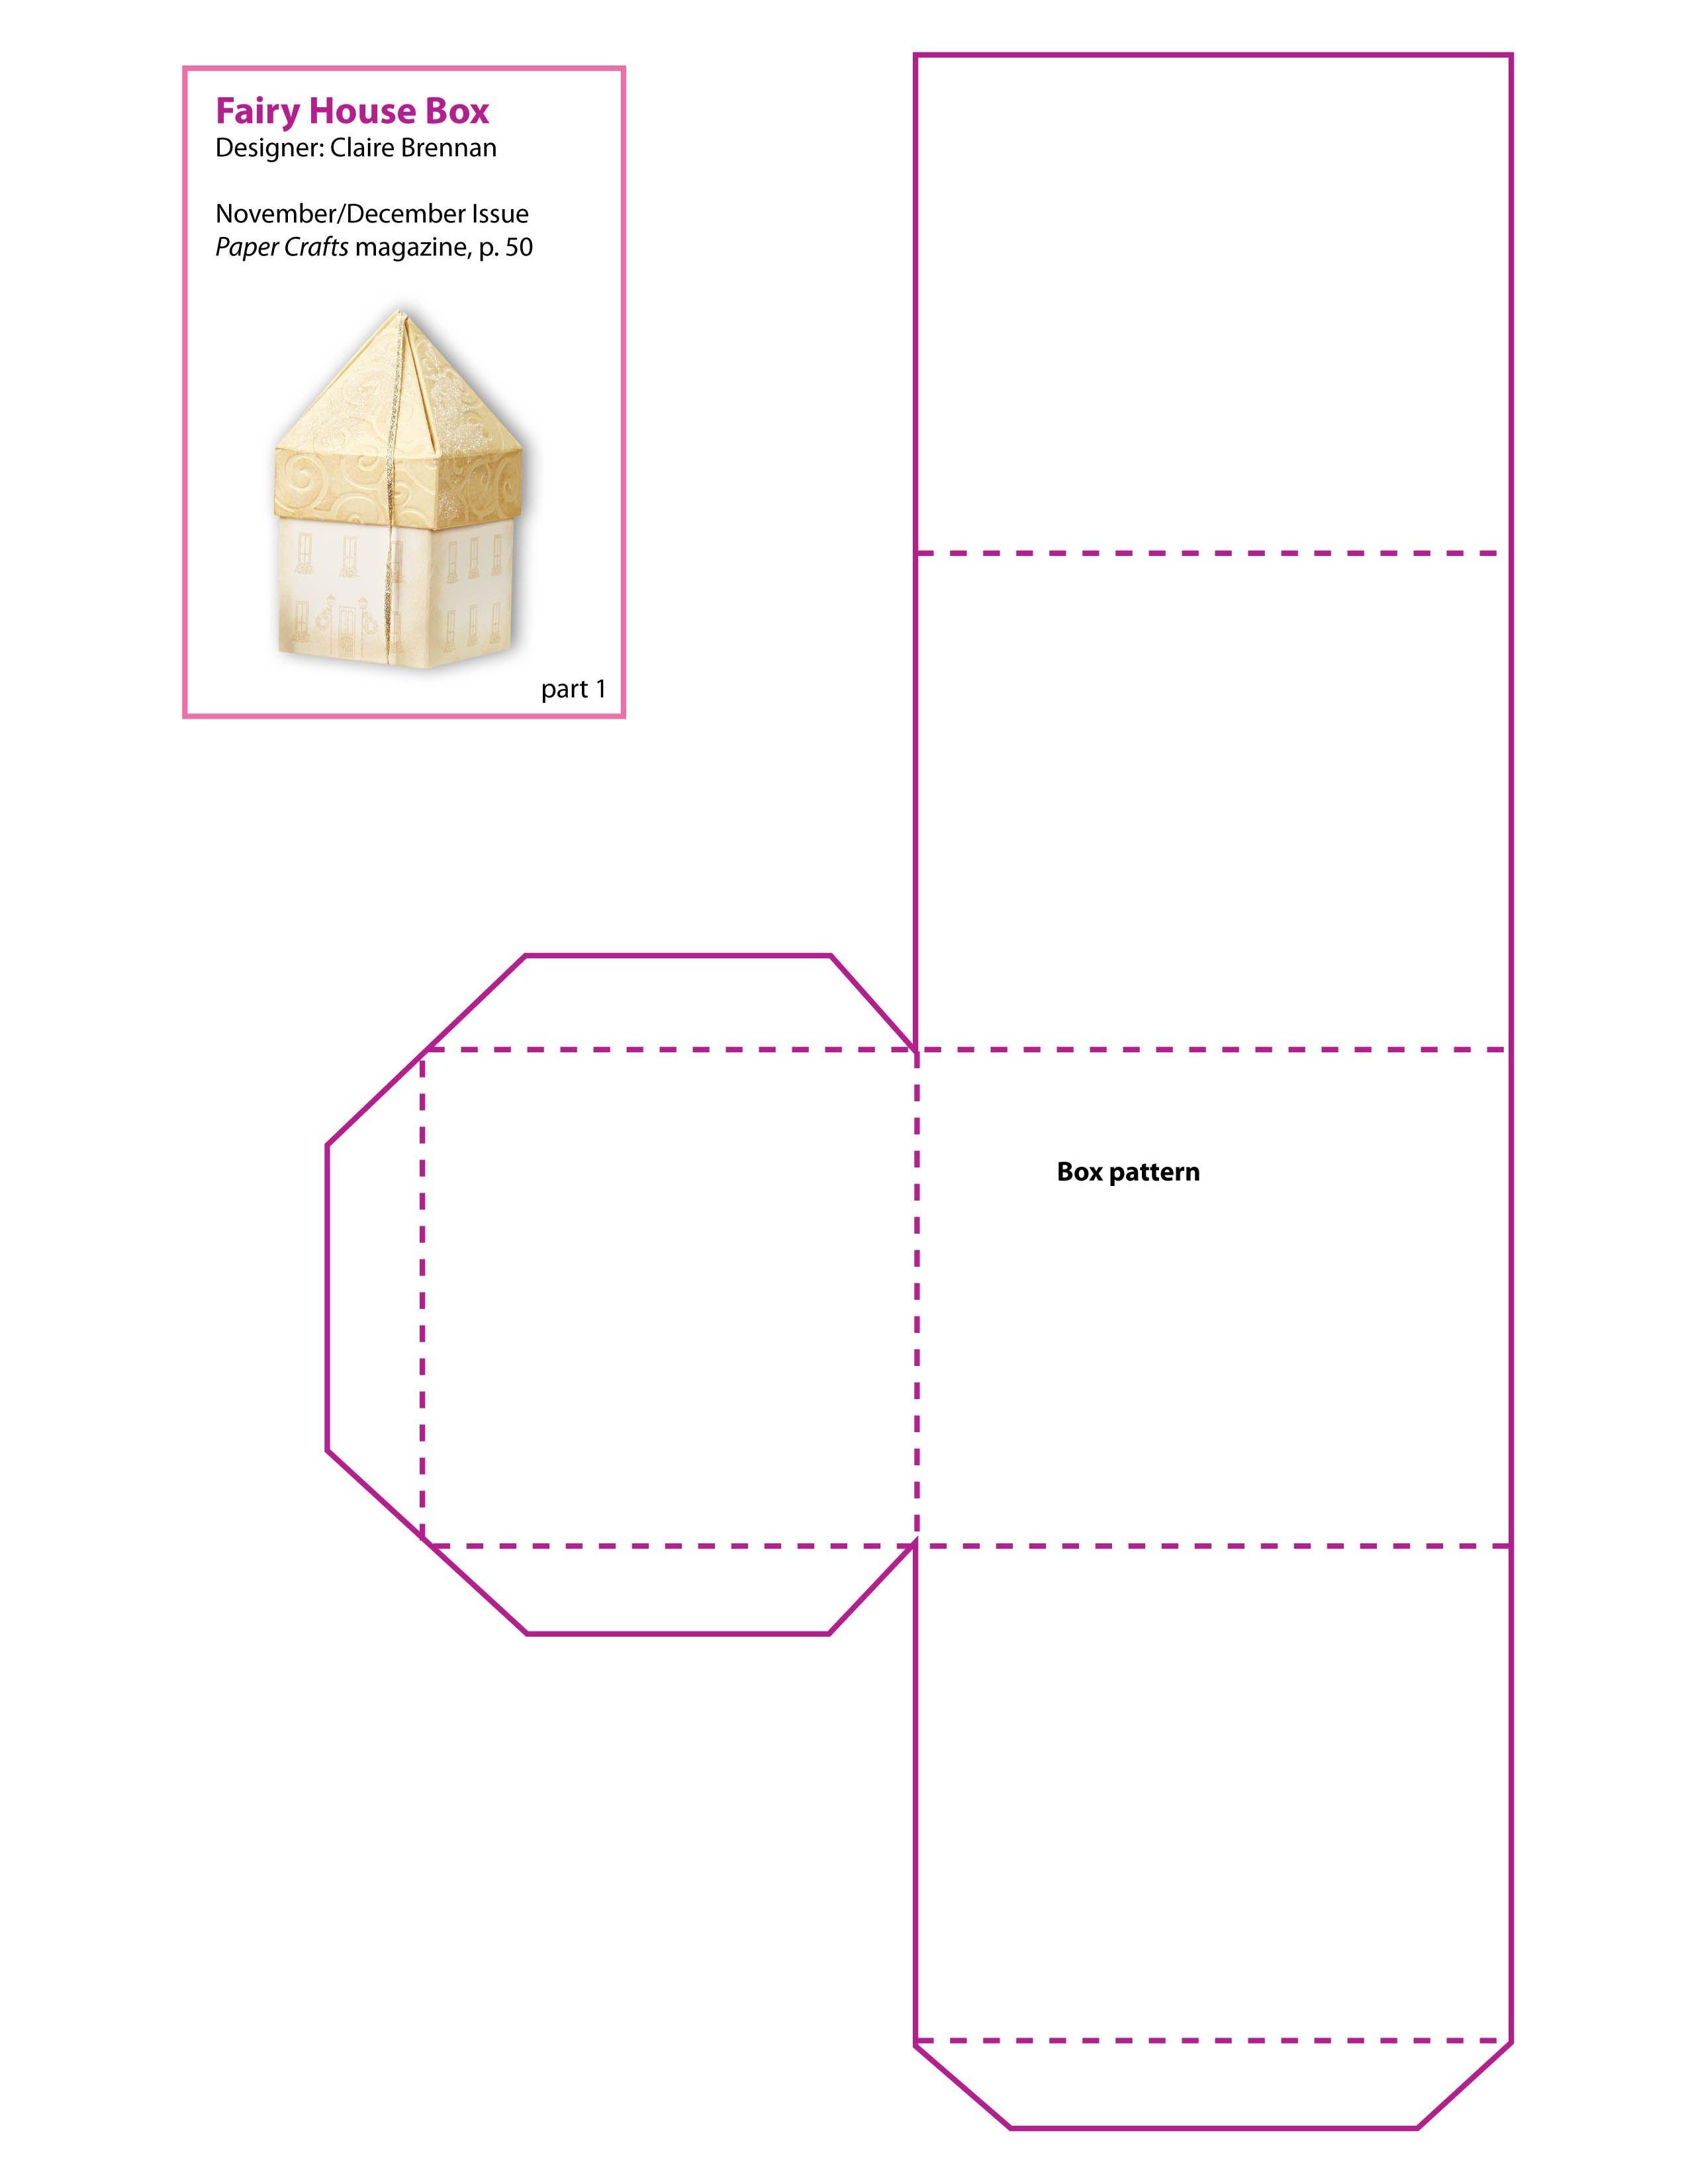 Free Printable Boxes Patterns   Free Printable Scrapbook Pages,print - Box Templates Free Printable